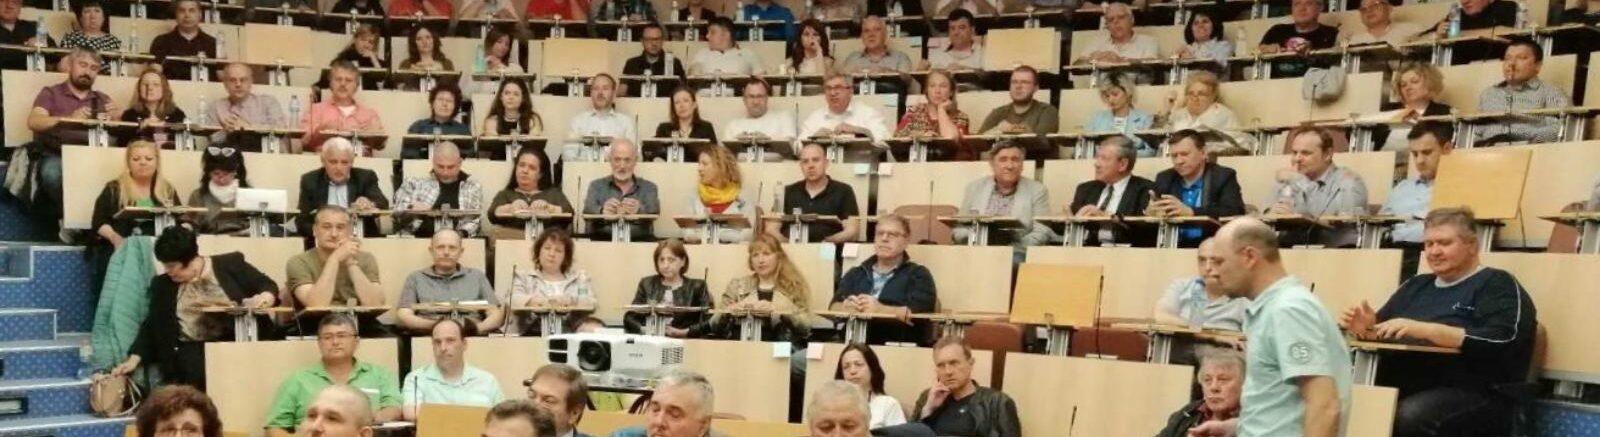 snimka_kongres